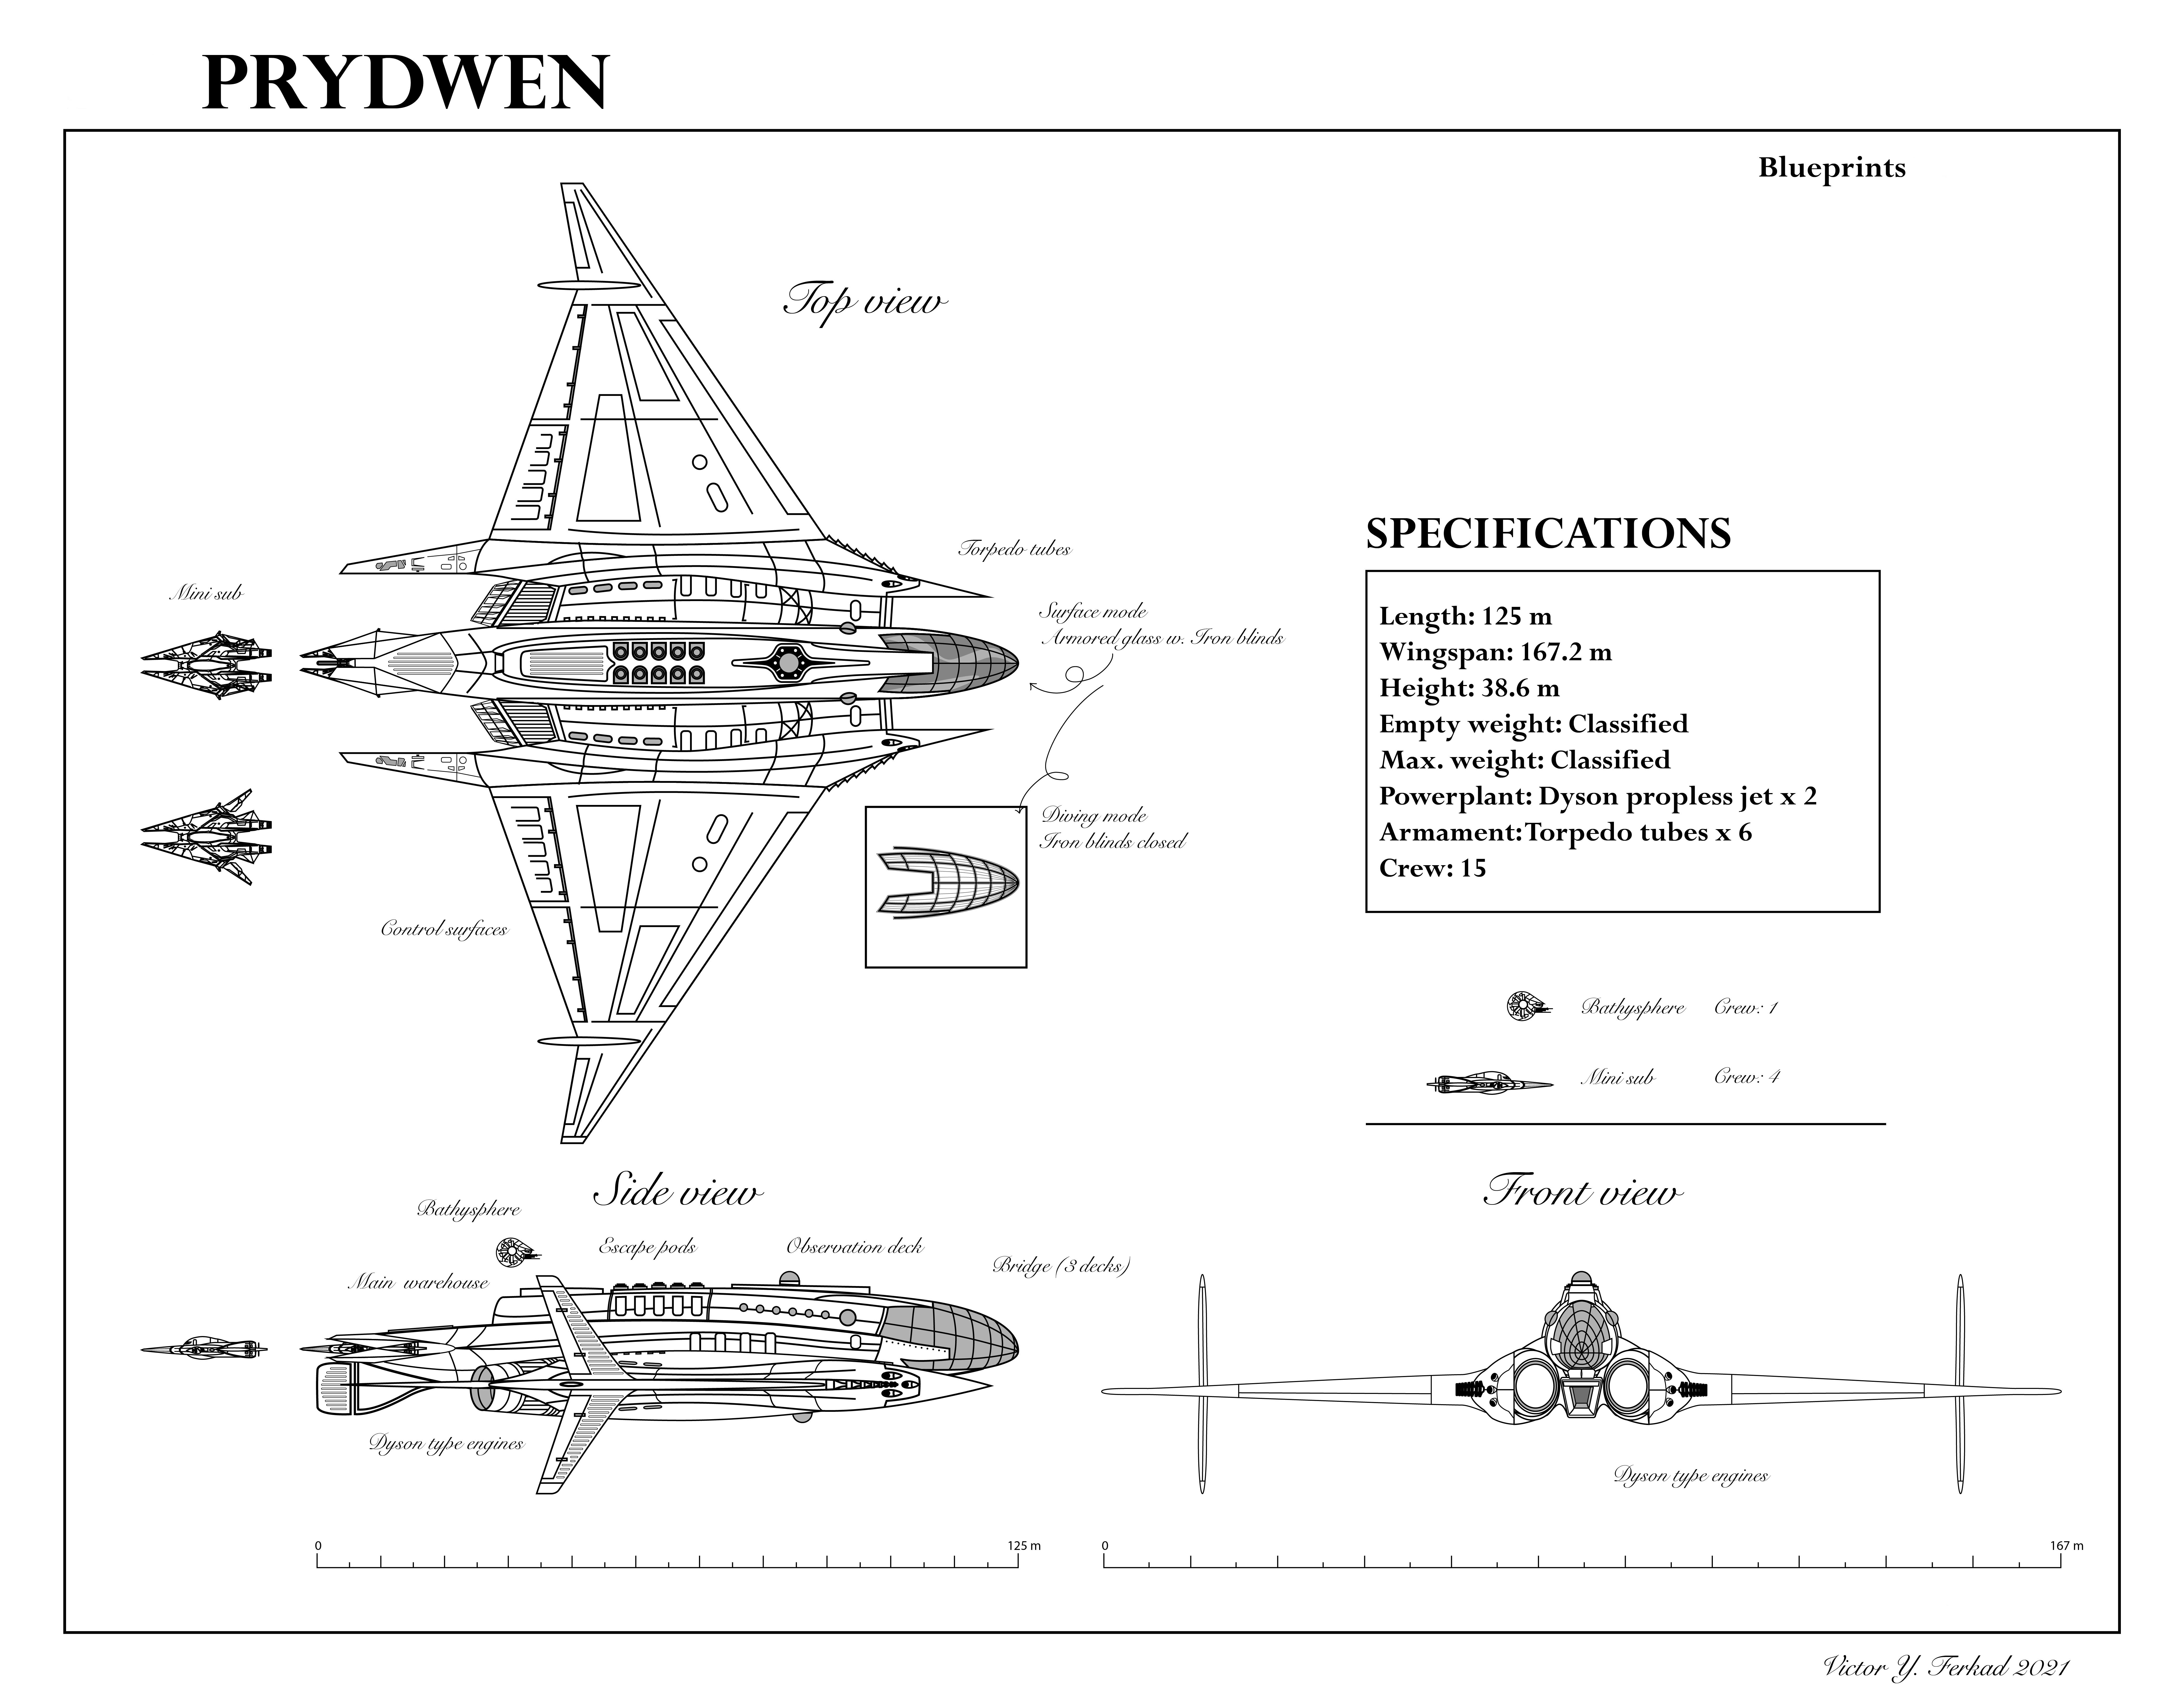 Prydwen Blueprint